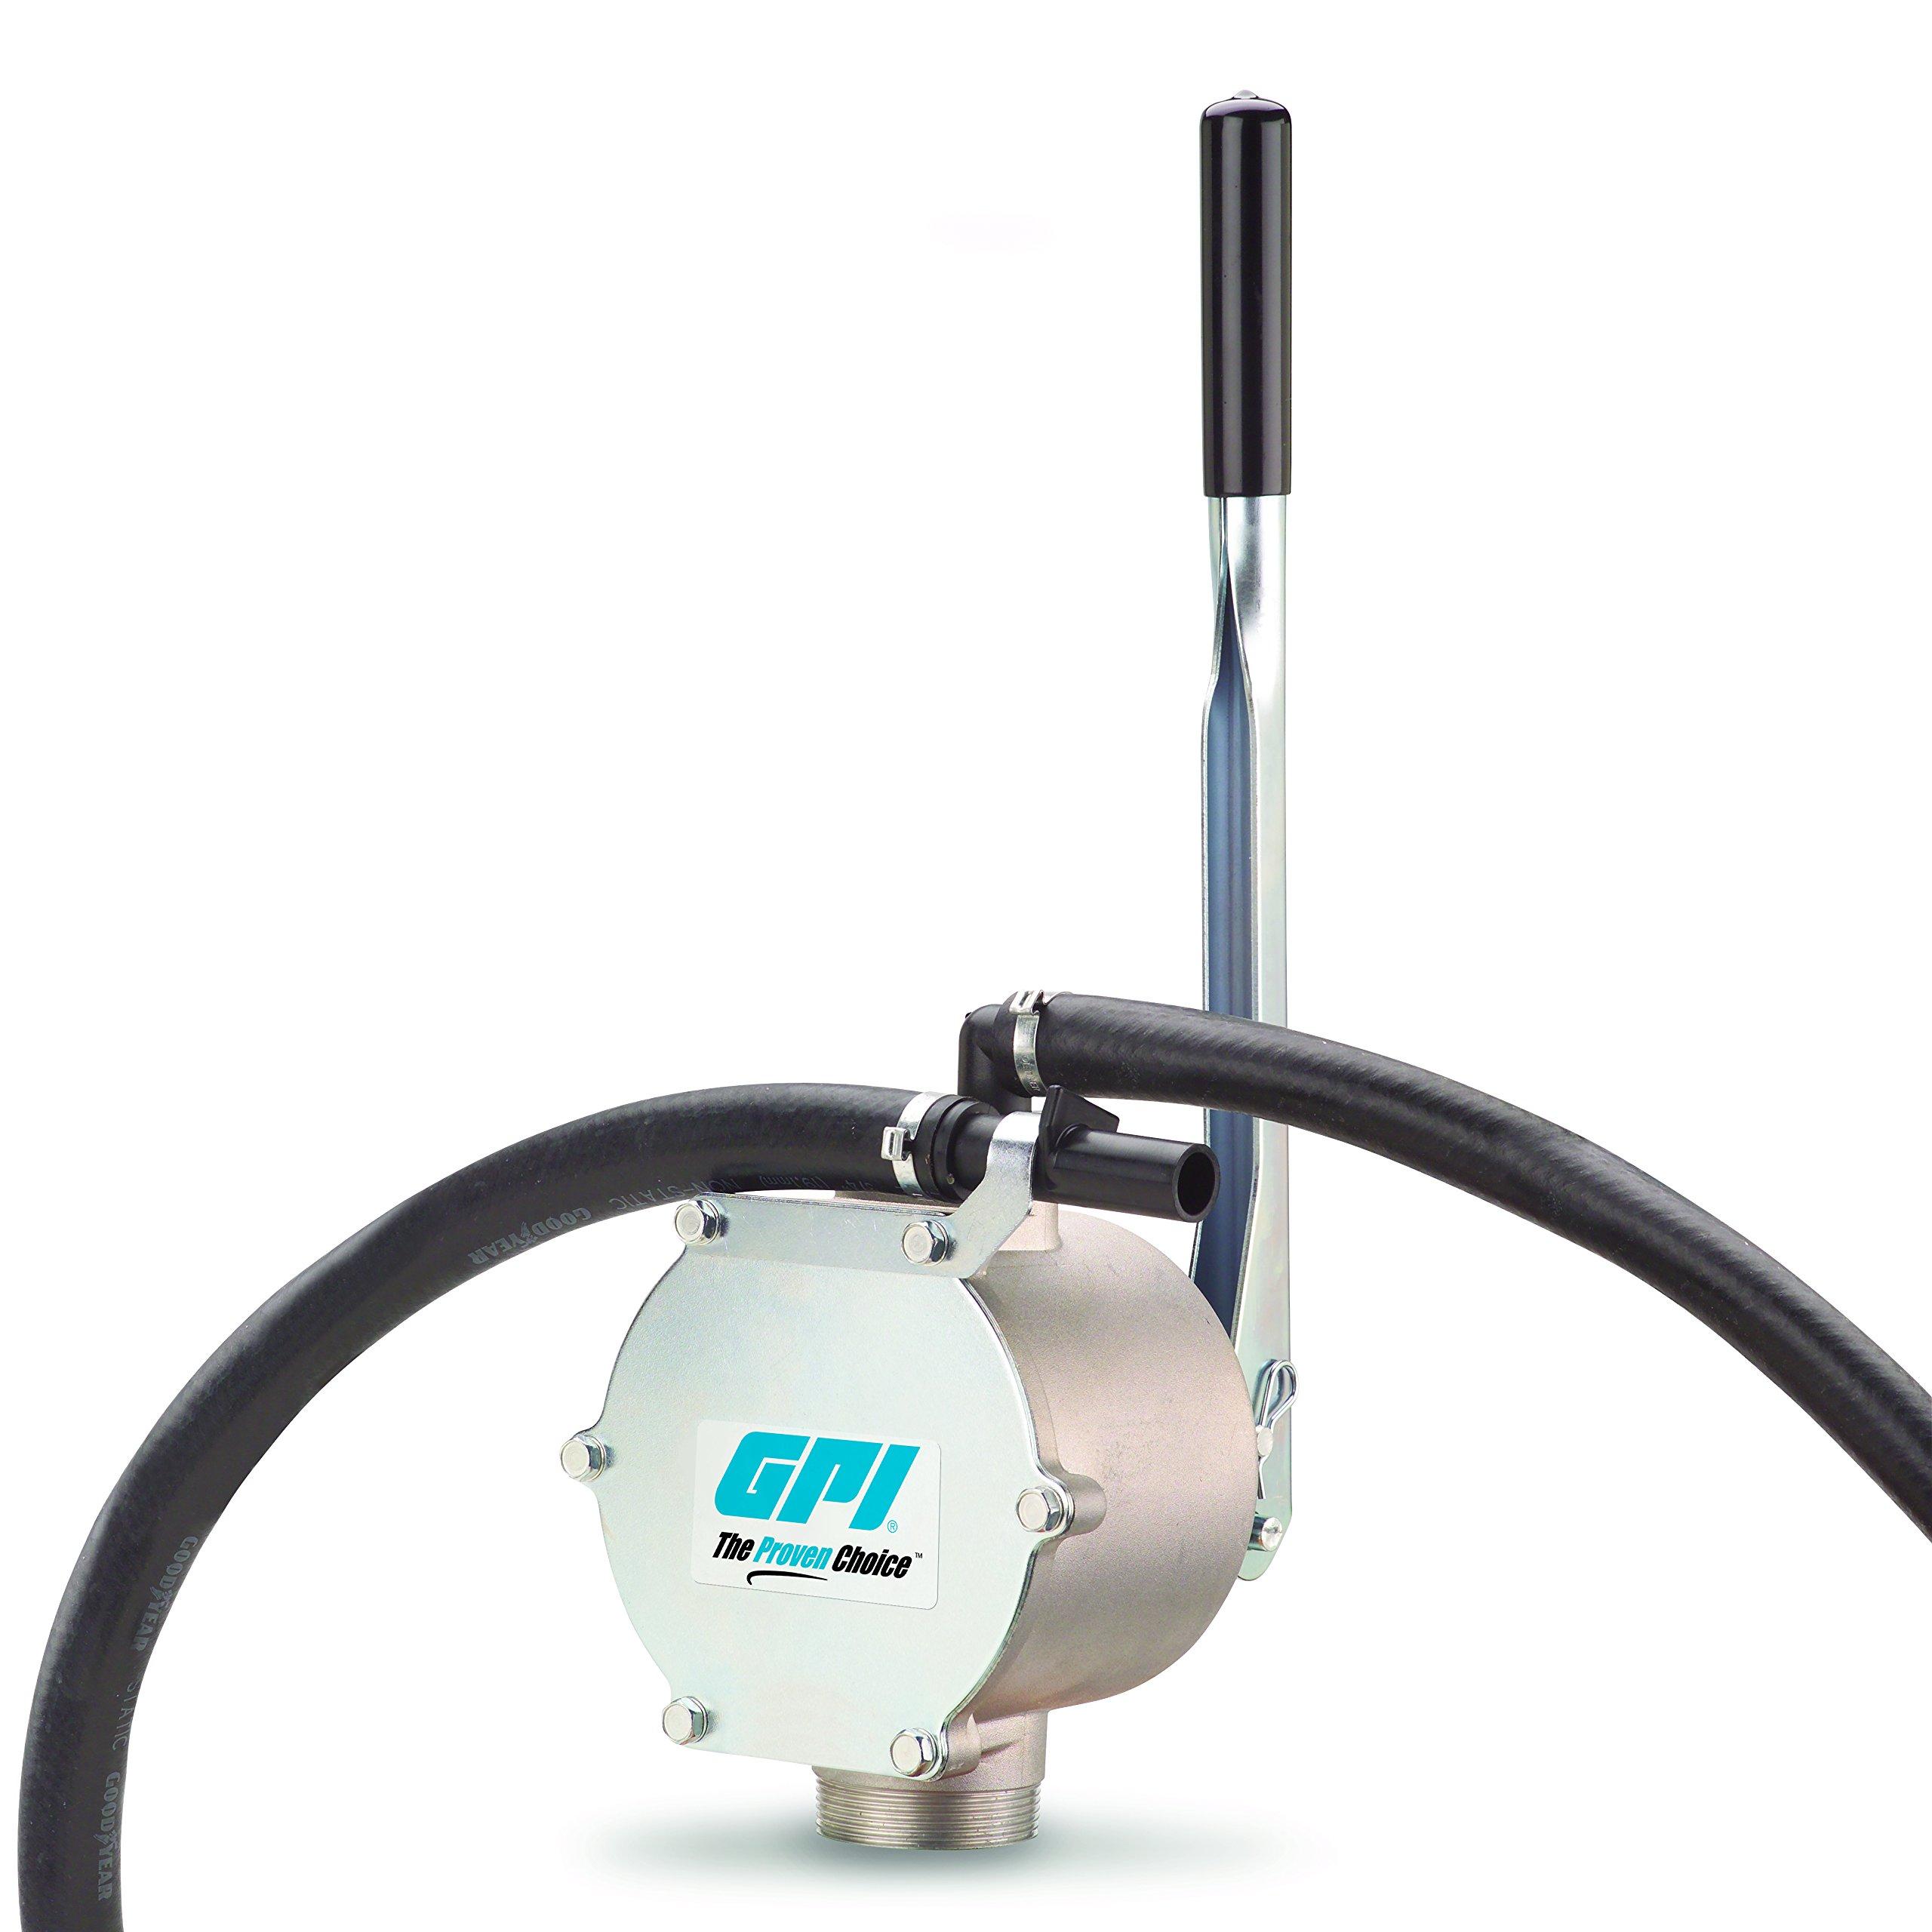 GPI 131000-1, HP-90 Dual Action Aluminum Piston Fuel Transfer Hand Pump, 1 Quart per Stroke, Hose, Plastic Nozzle & Suction Pipe